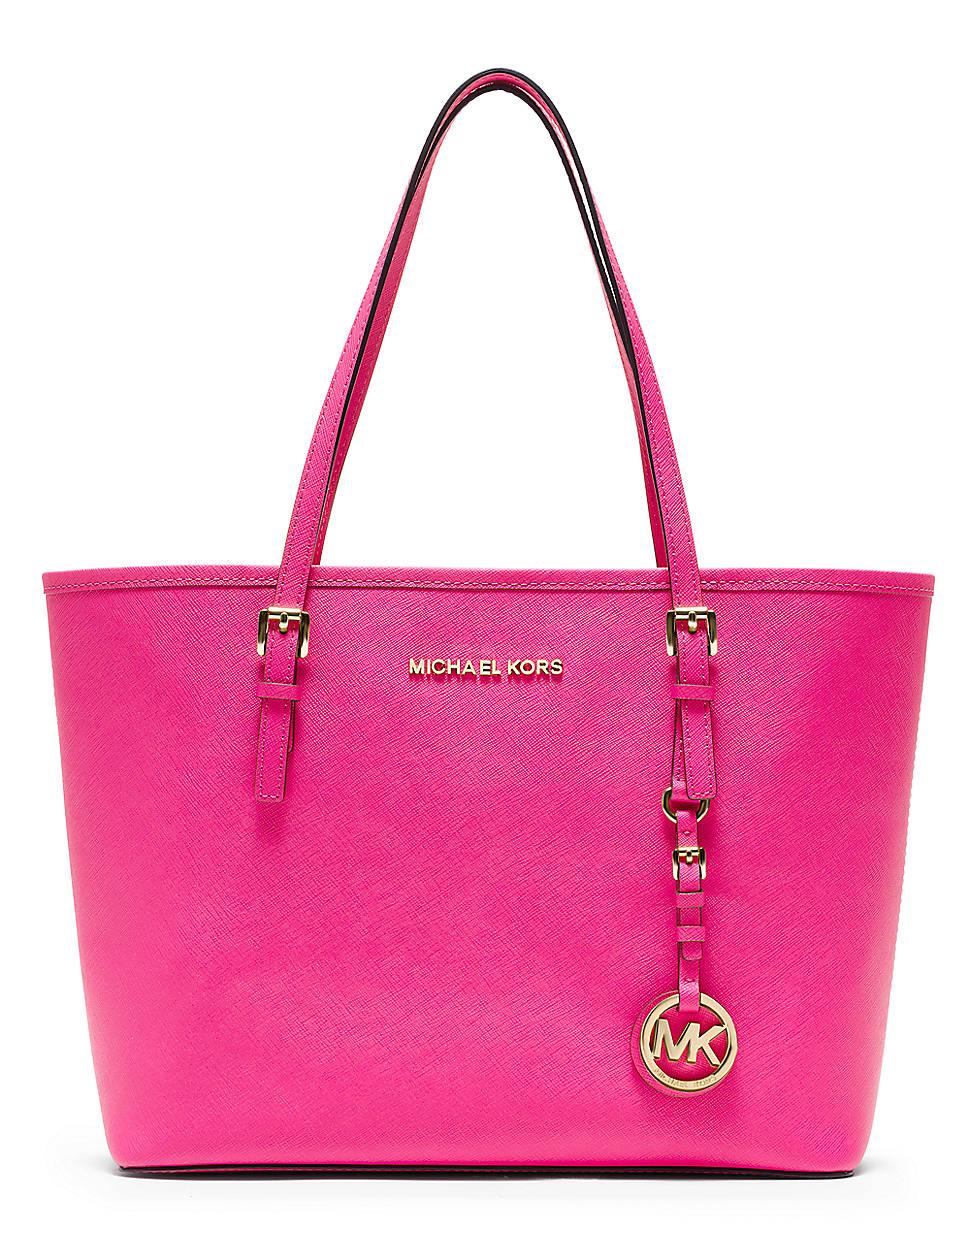 Michael Kors Jetset Travel Pink Tote Bag